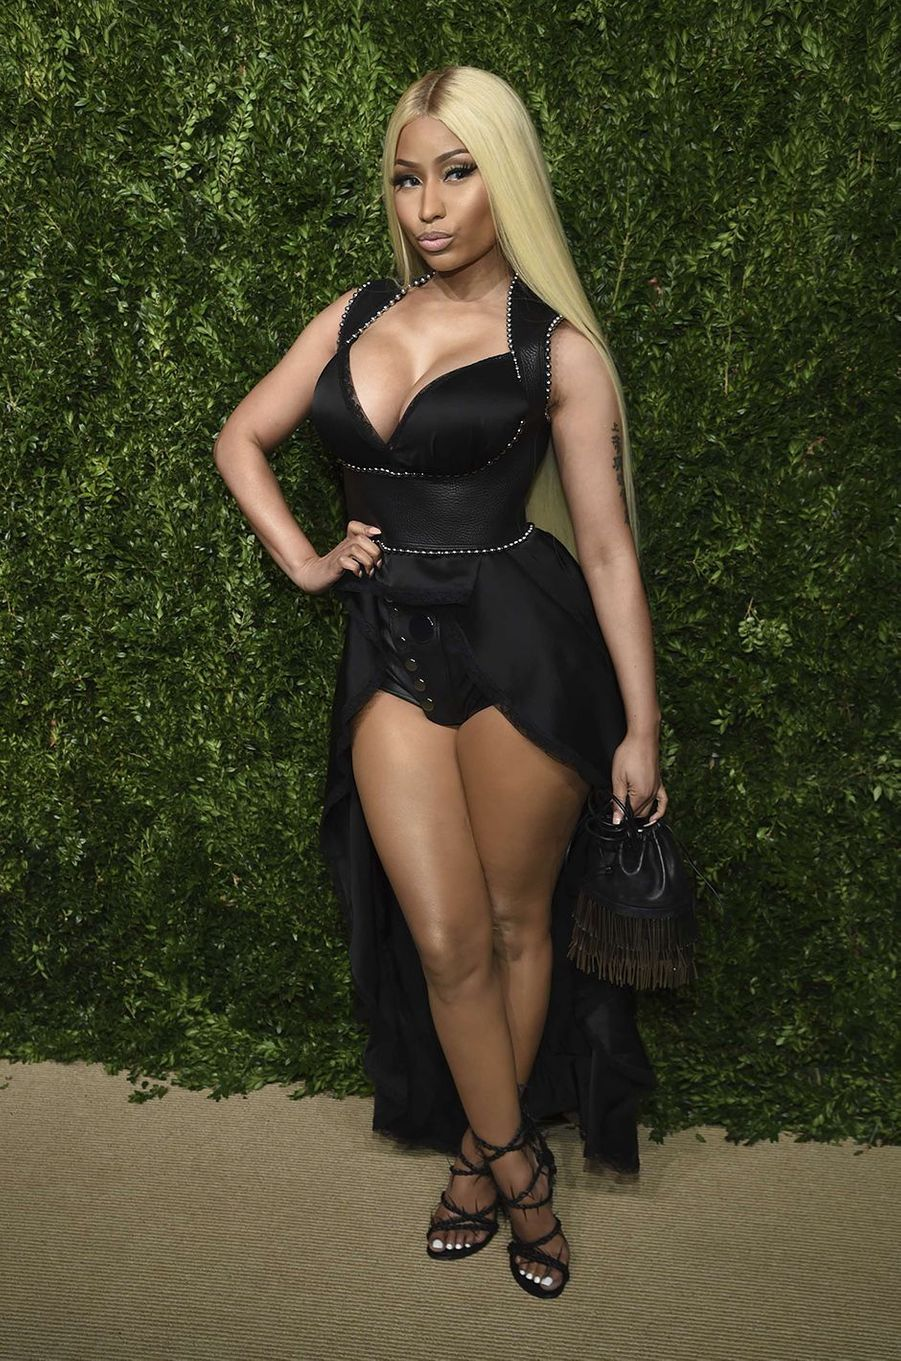 Nicki Minaj aux CFDA Fashion Awards, à New York, le 6 novembre 2017.